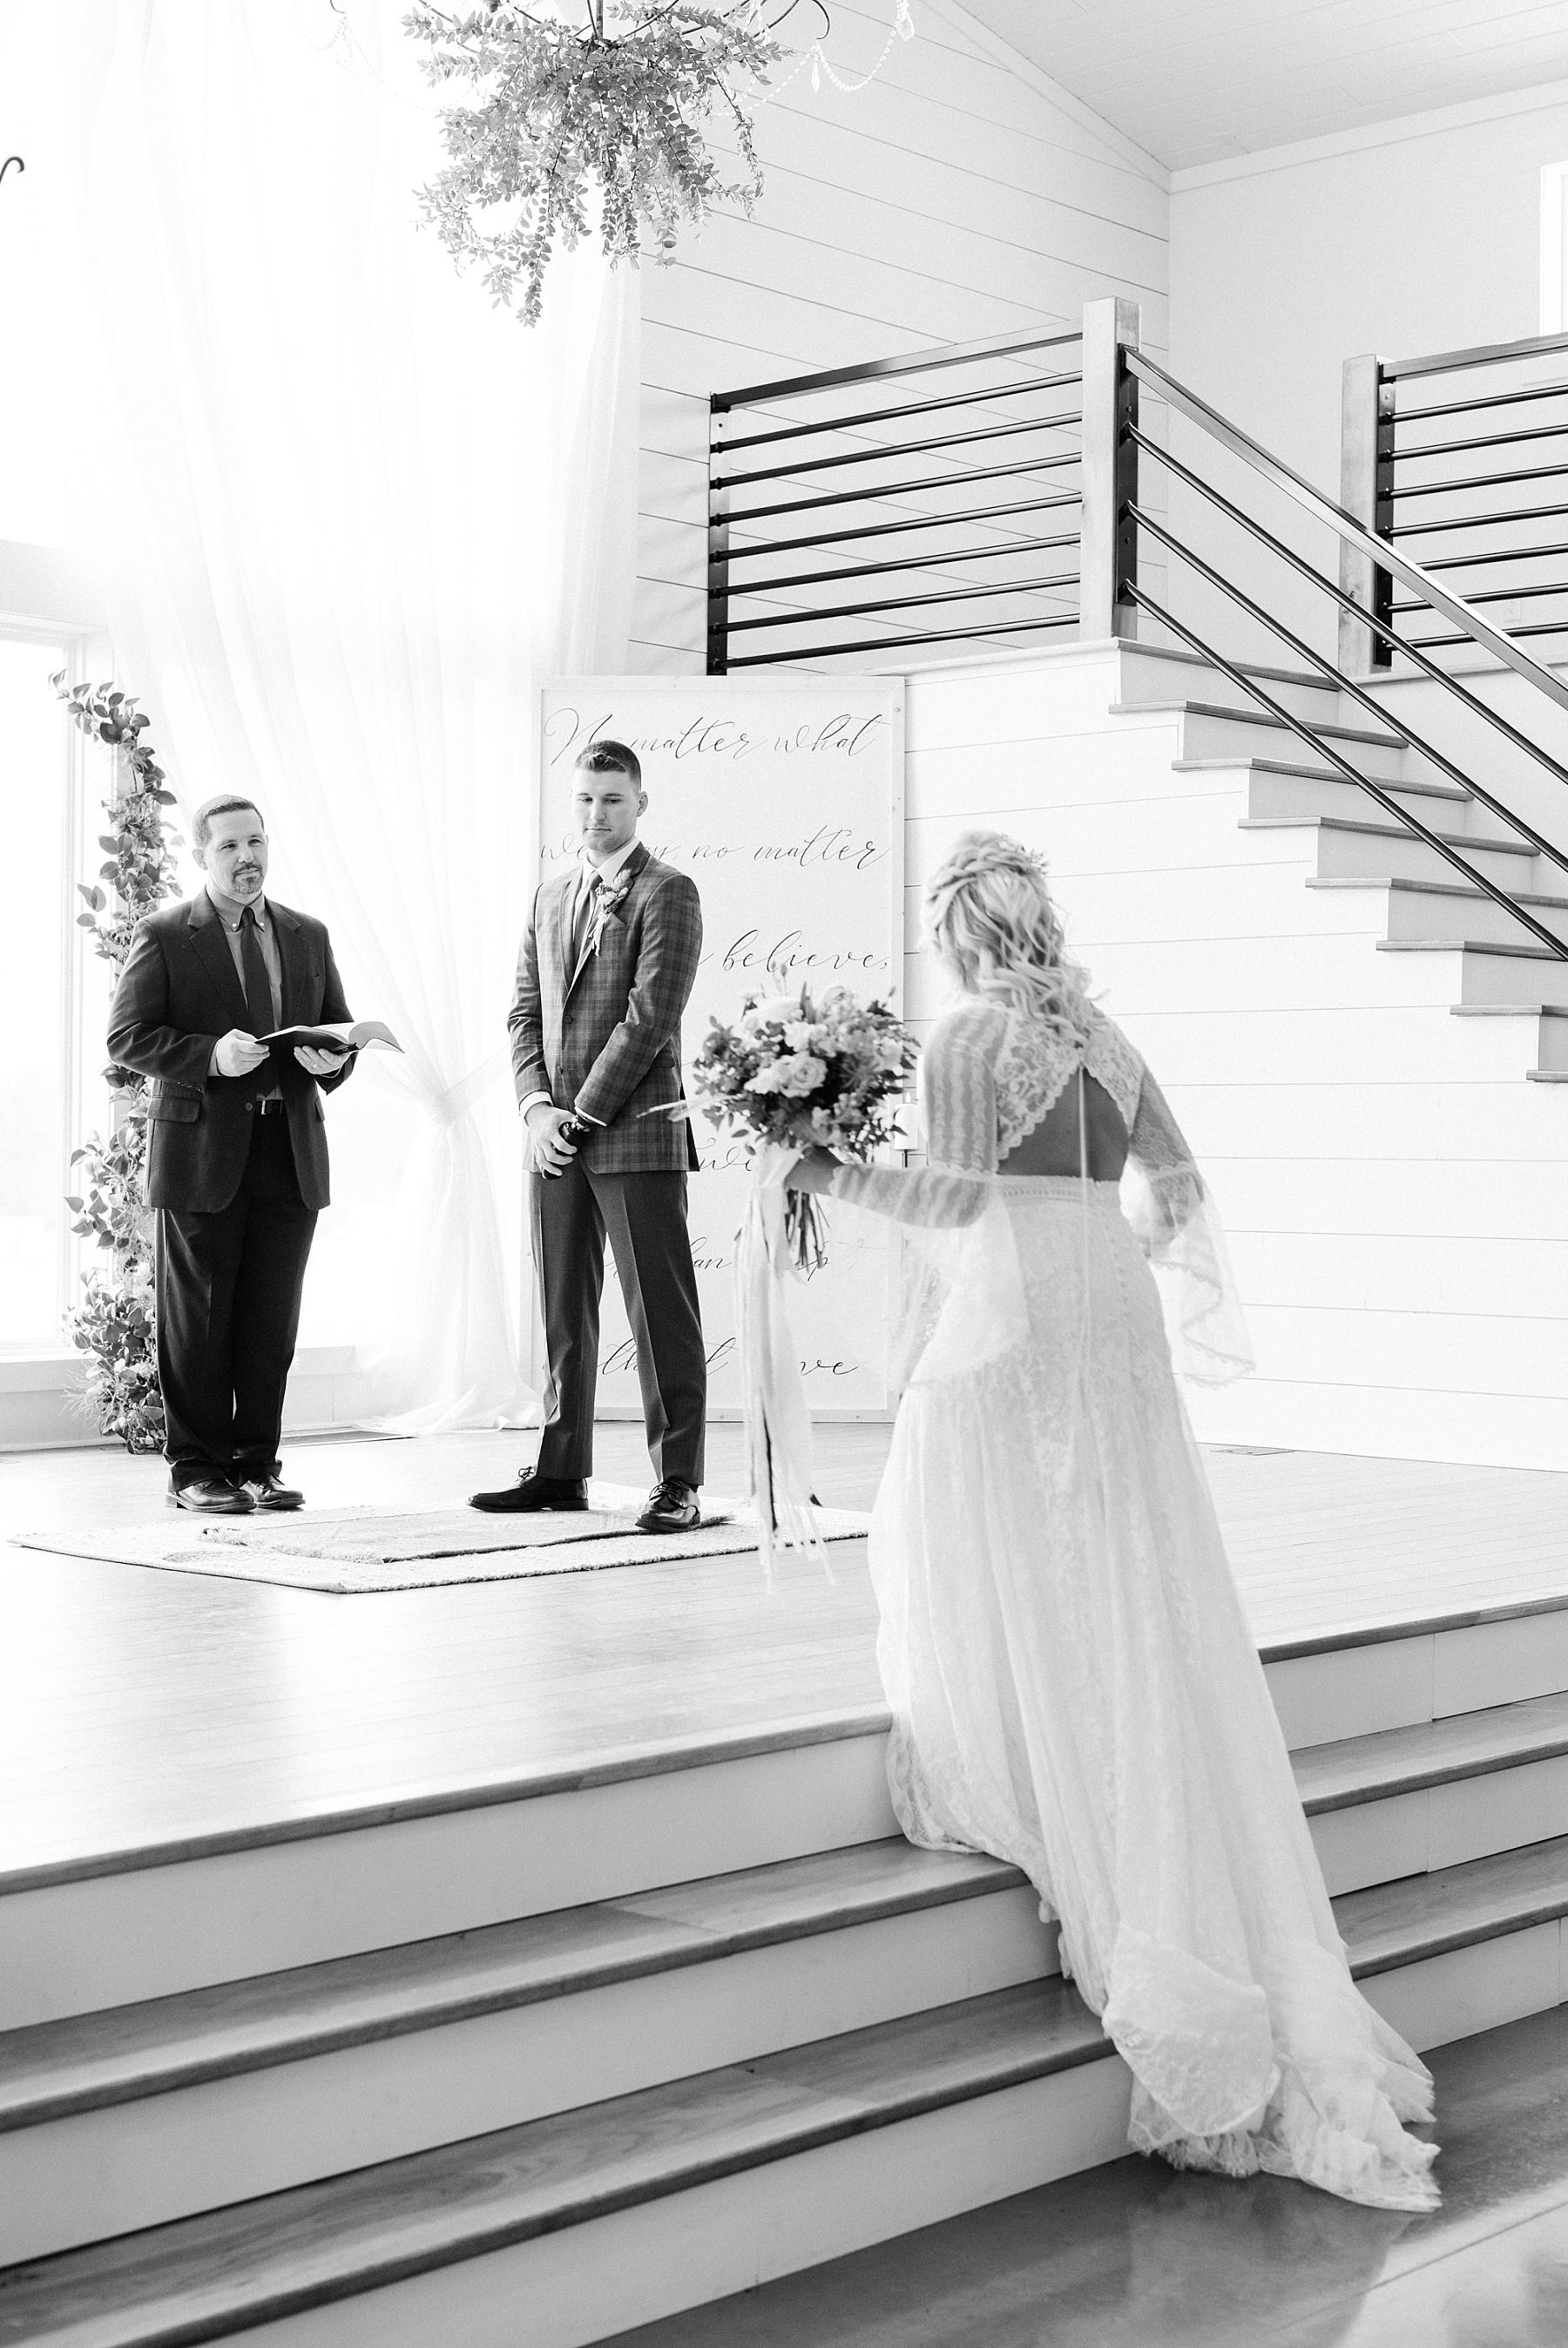 Eclectic Scandinavian Winter Wedding in All White Venue Emerson Fields by Kelsi Kliethermes Photography Best Missouri and Maui Wedding Photographer_0056.jpg